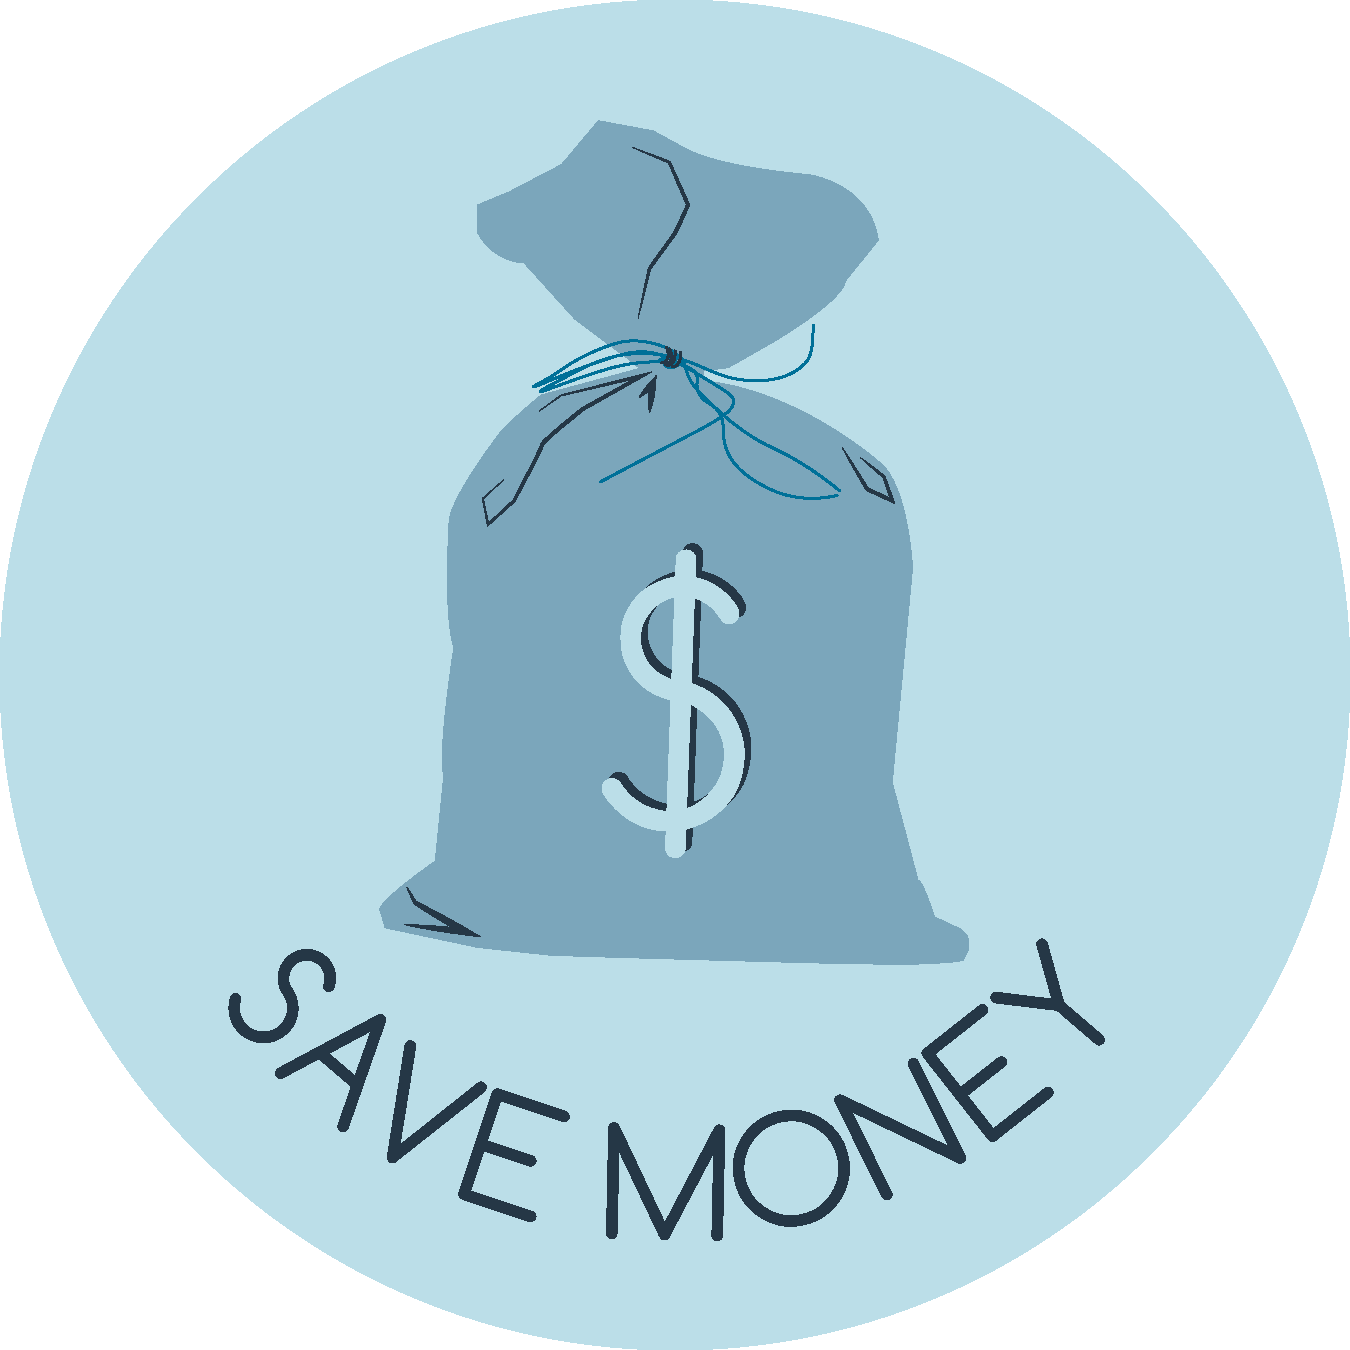 Fathom Five Save Money